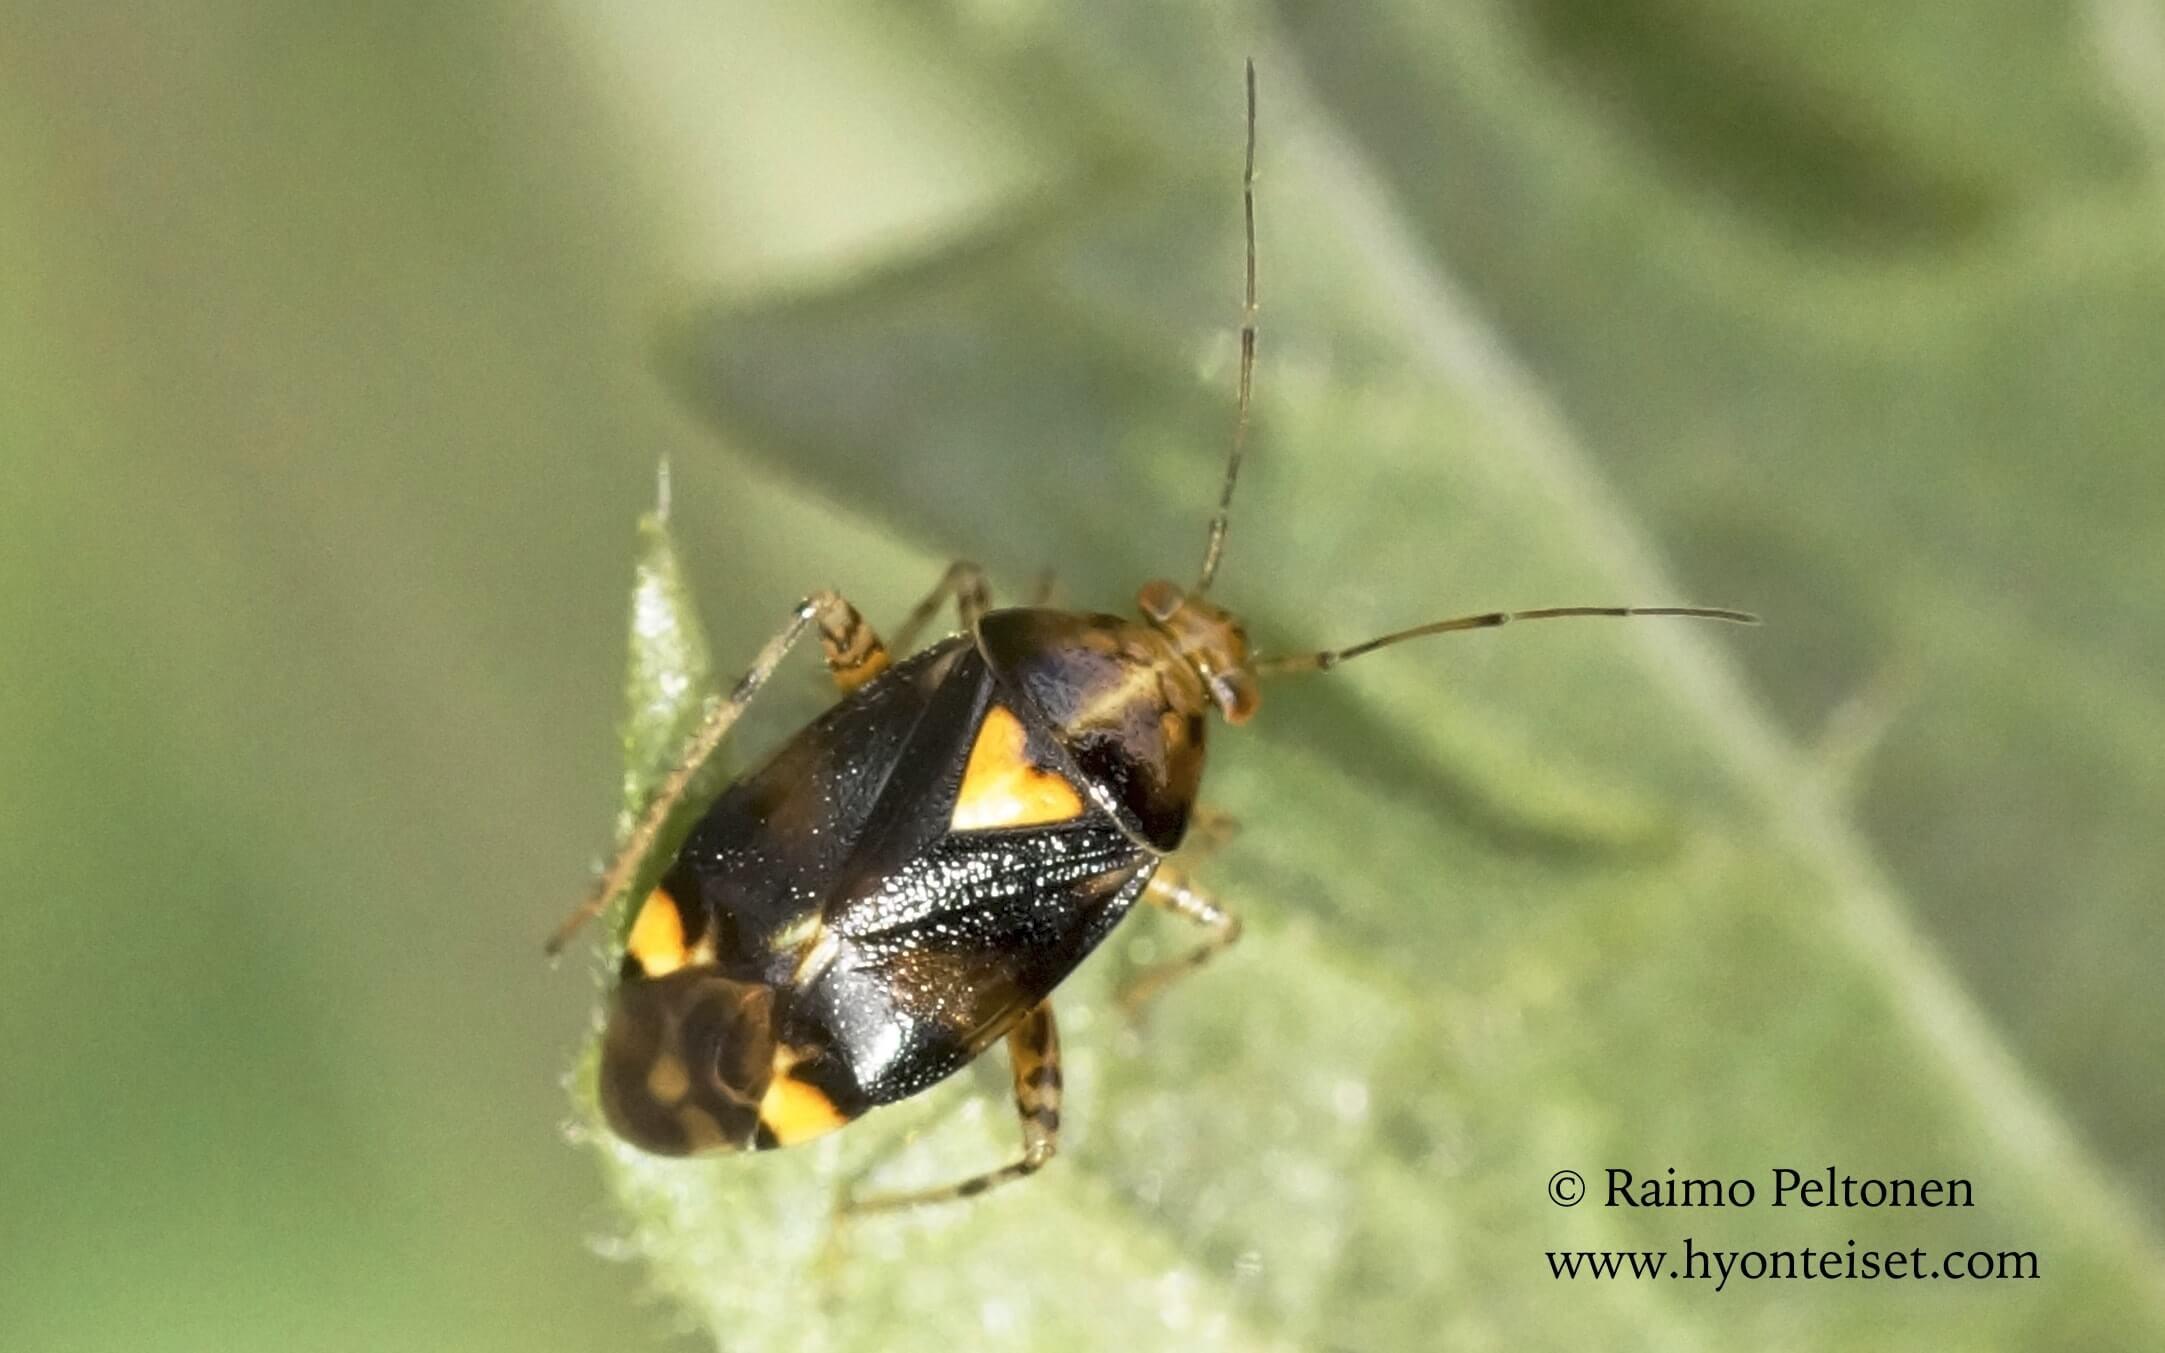 Liocoris tripustulatus-nokkoslude